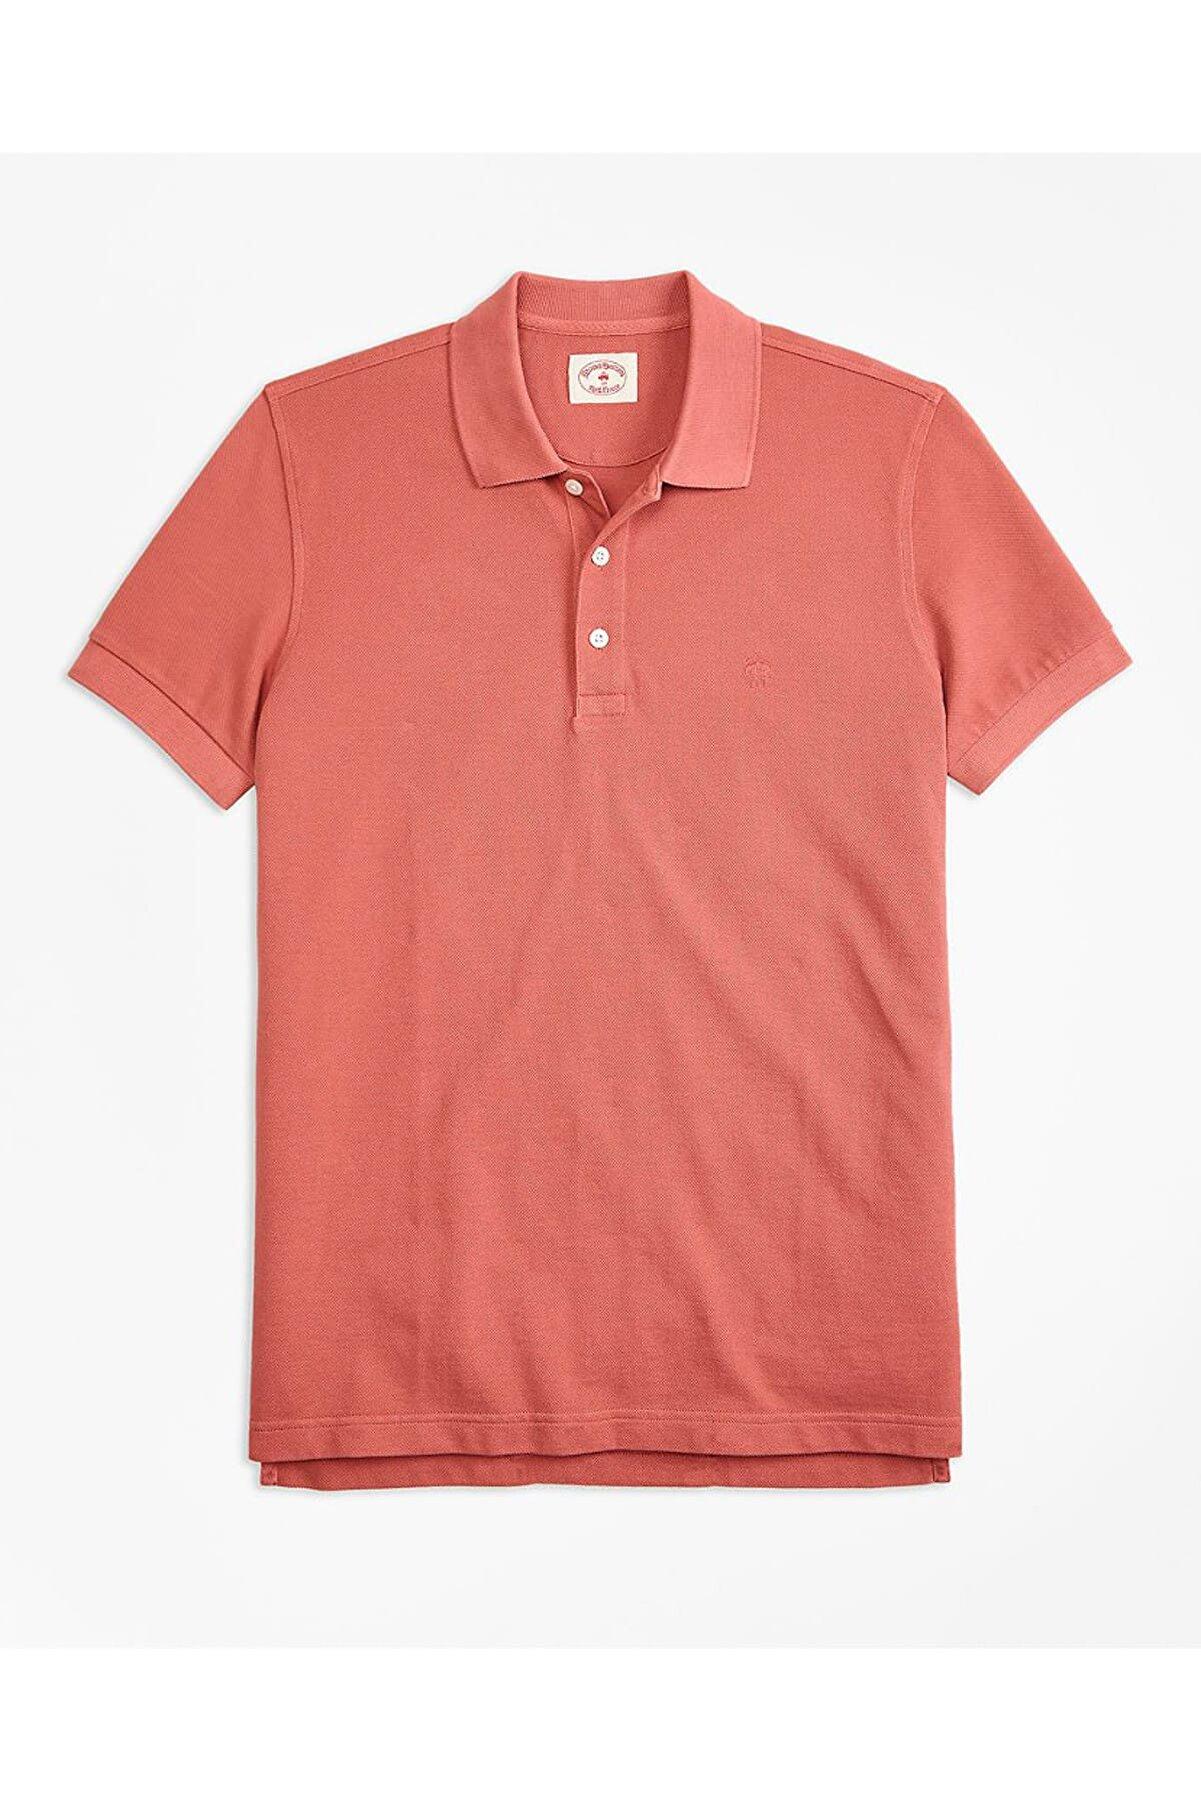 BROOKS BROTHERS Erkek Pembe Polo Yaka T-shirt